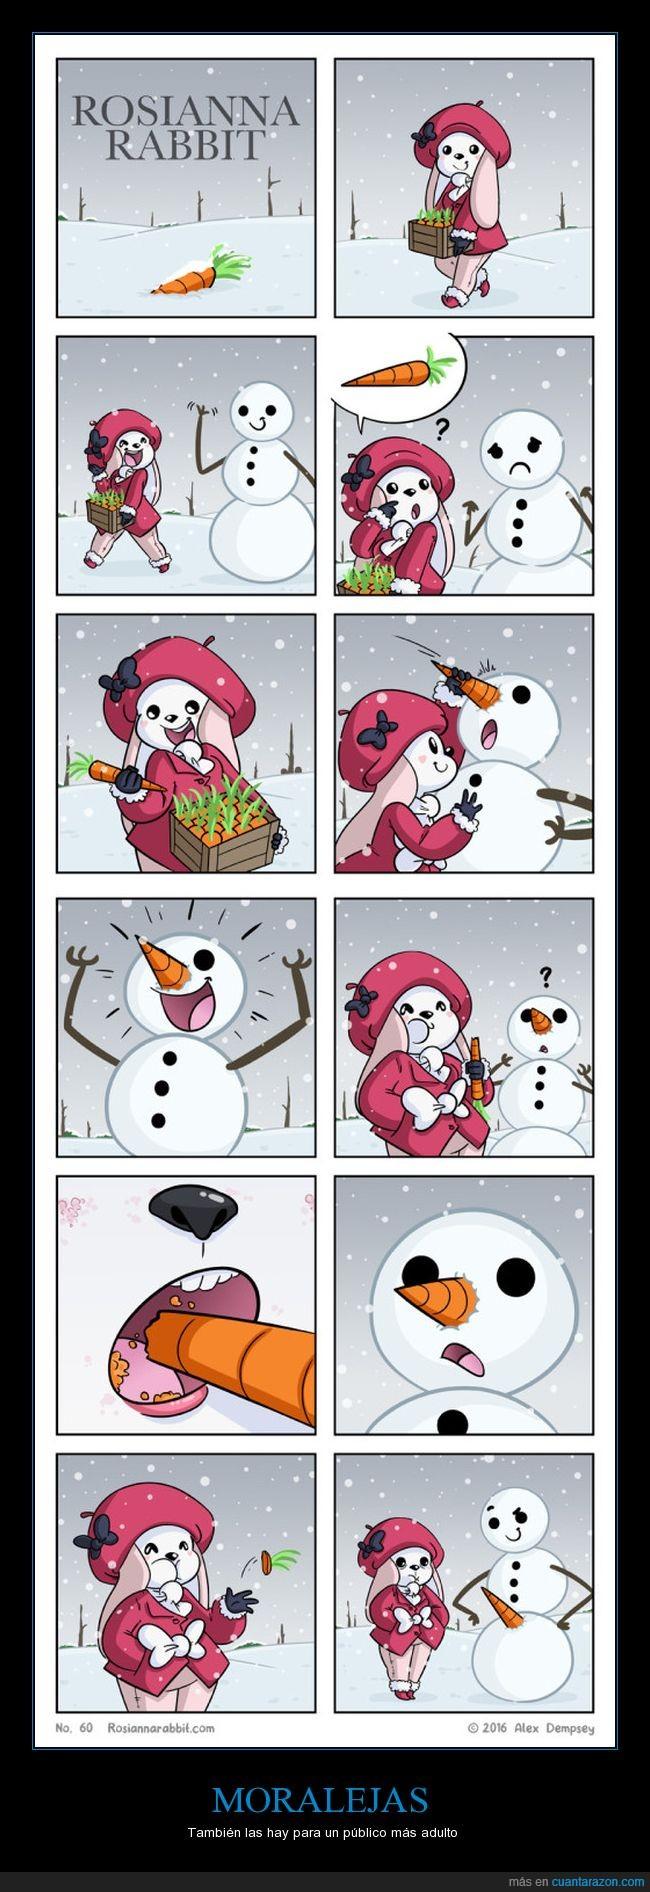 conejo,muñeco,nieve,zanahoria